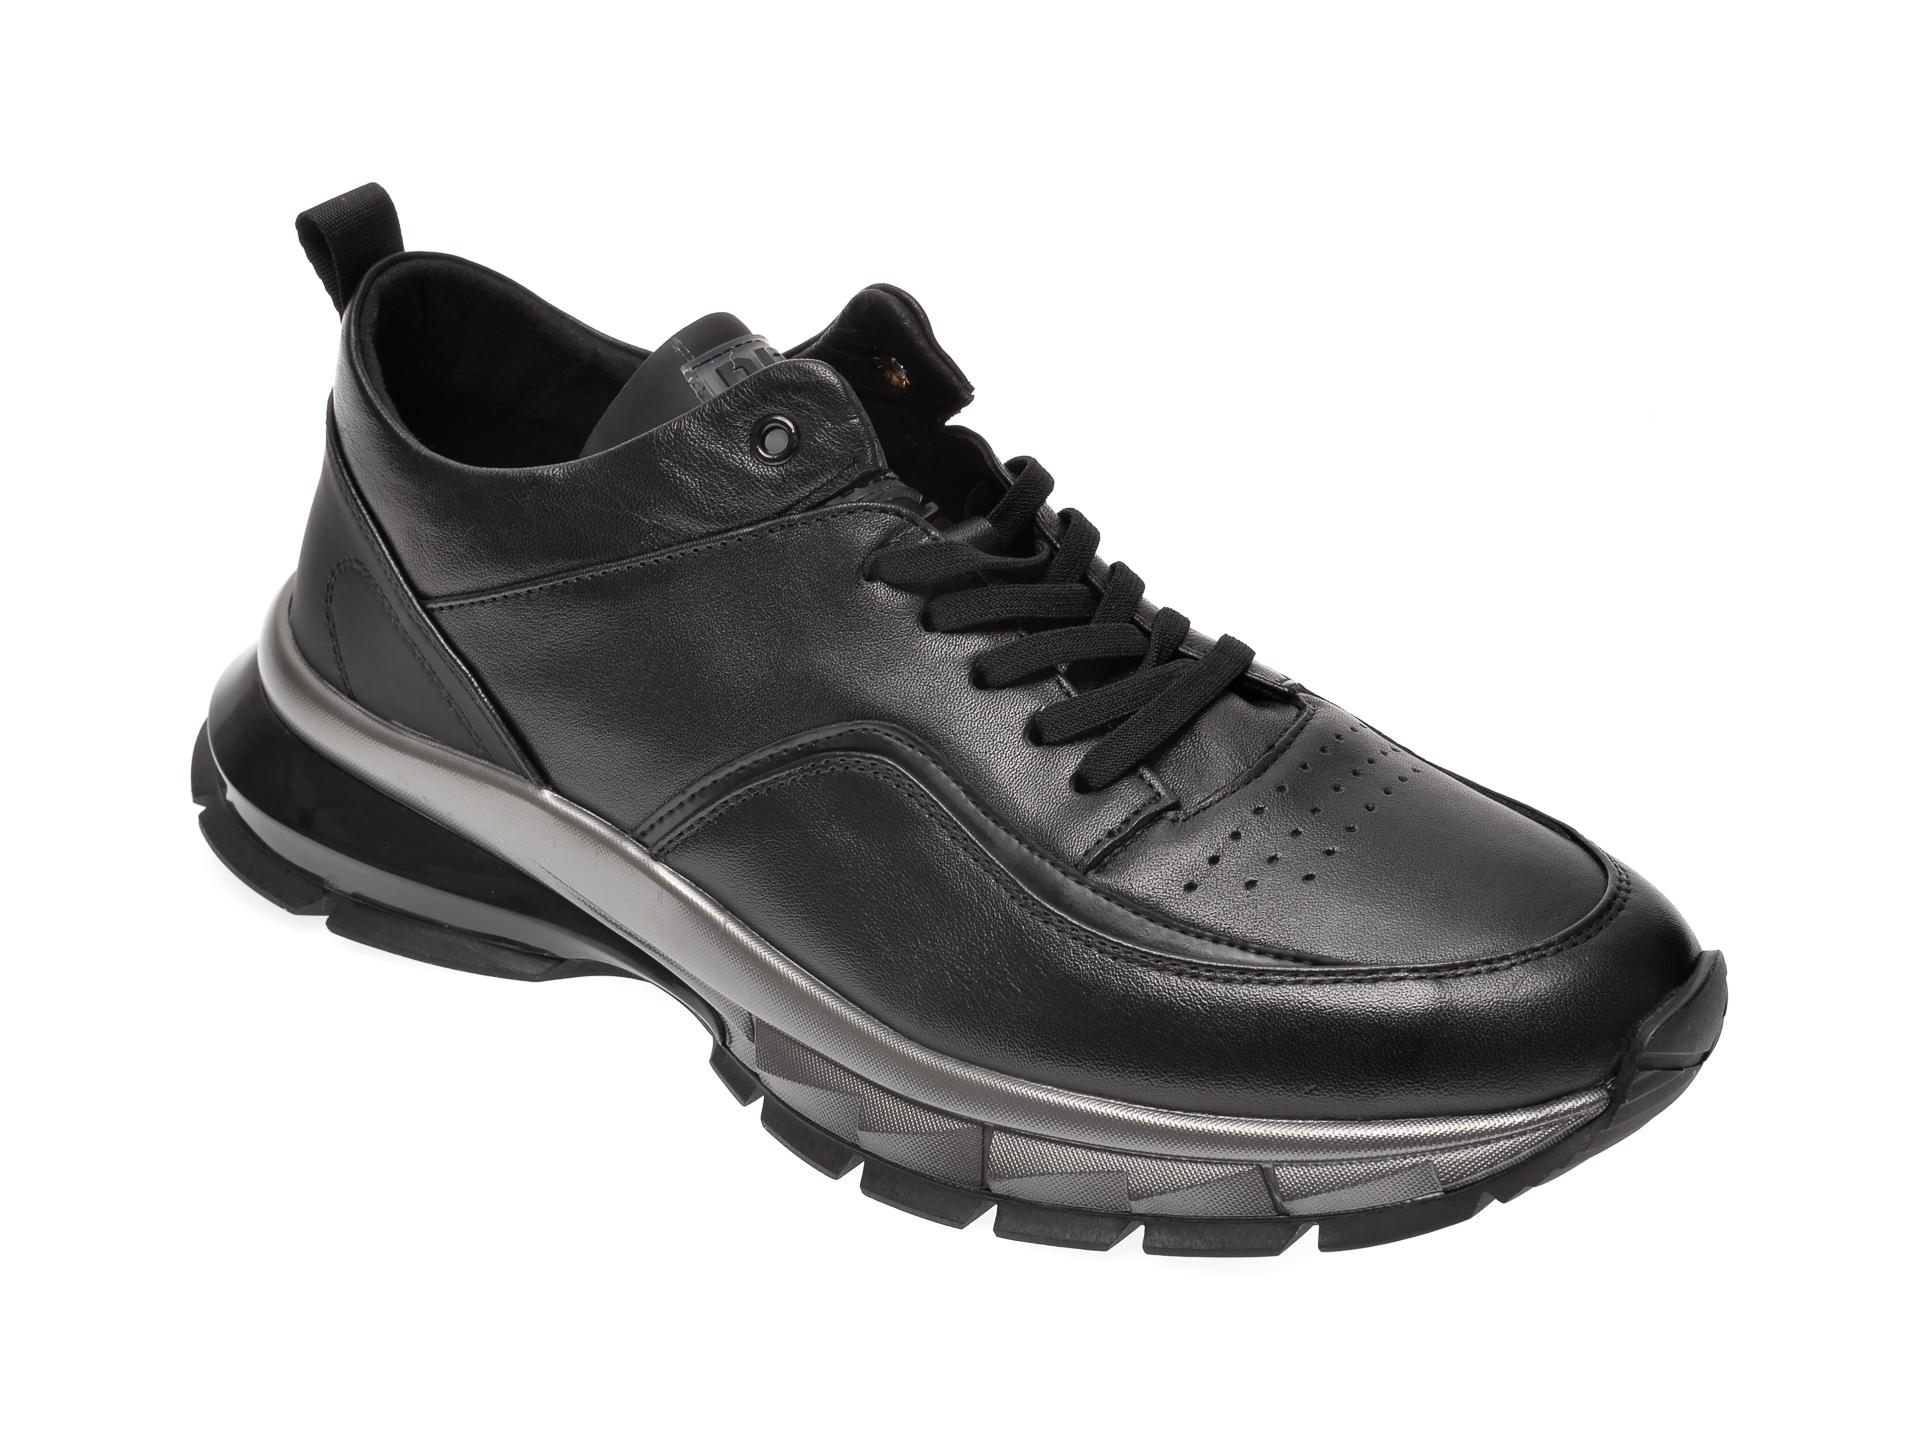 Pantofi sport BITE THE BULLET negri, 25770, din piele naturala imagine